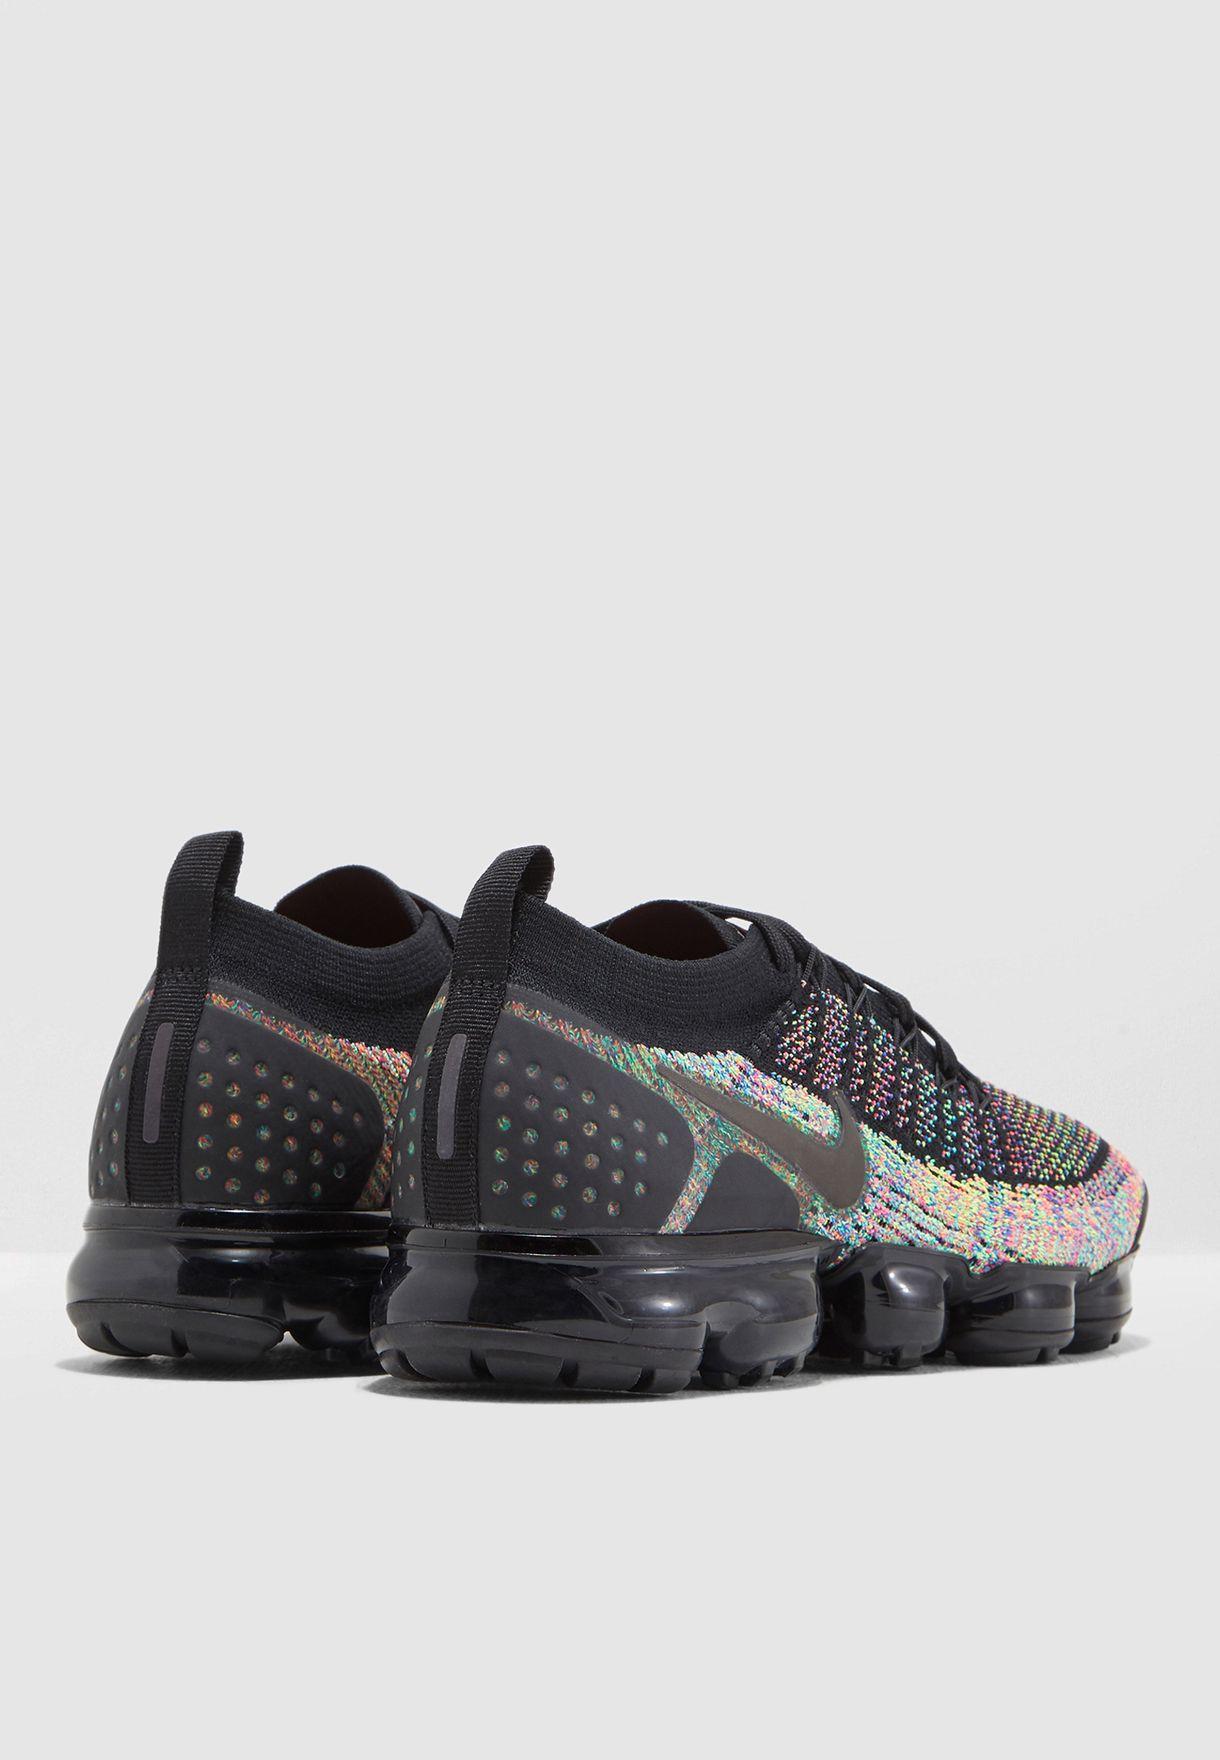 d67b748503f34 Shop Nike multicolor Air Vapormax Flyknit 2 942842-017 for Men in ...